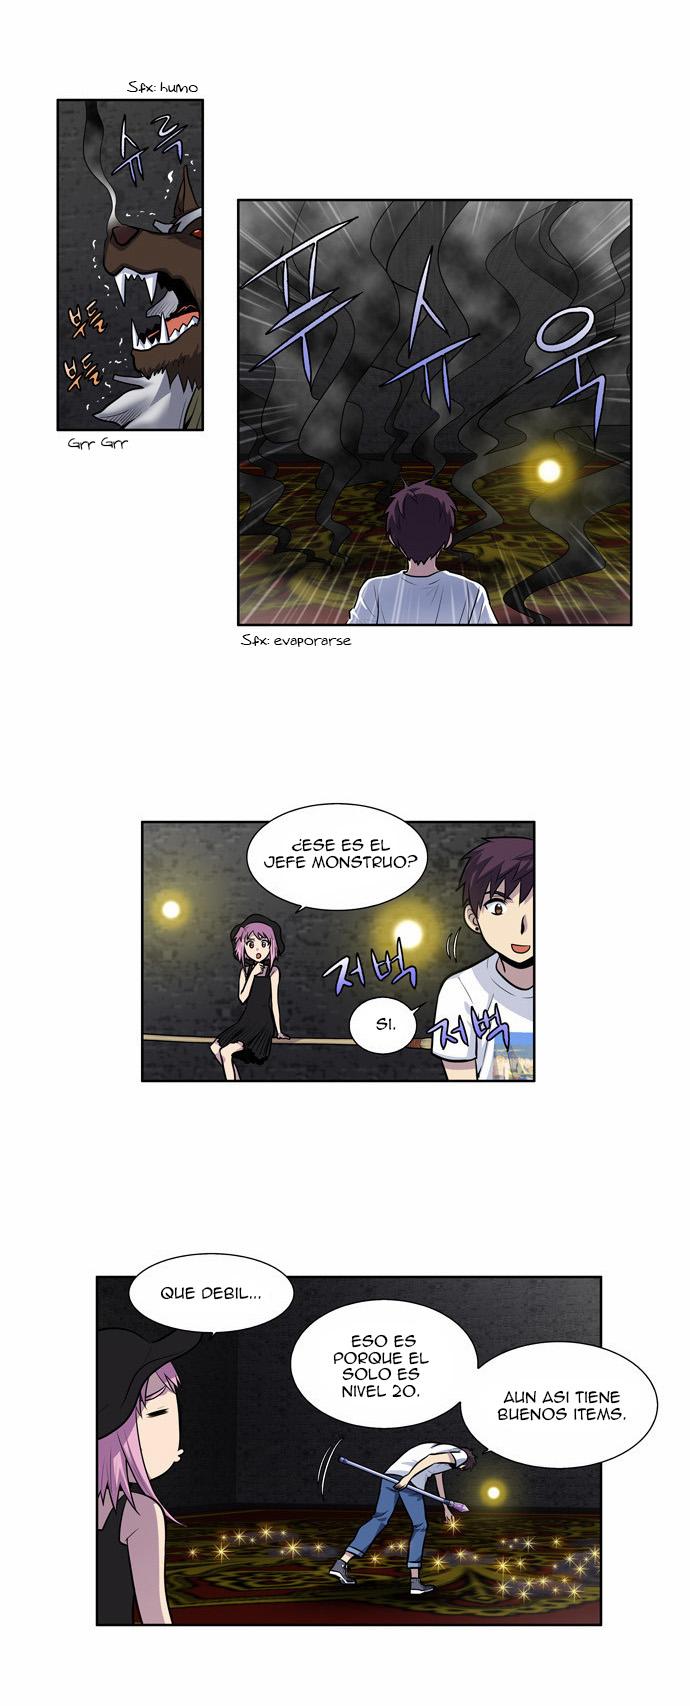 http://c5.ninemanga.com/es_manga/61/1725/416522/4543b6dbb458e8af5648d602a11ba977.jpg Page 3